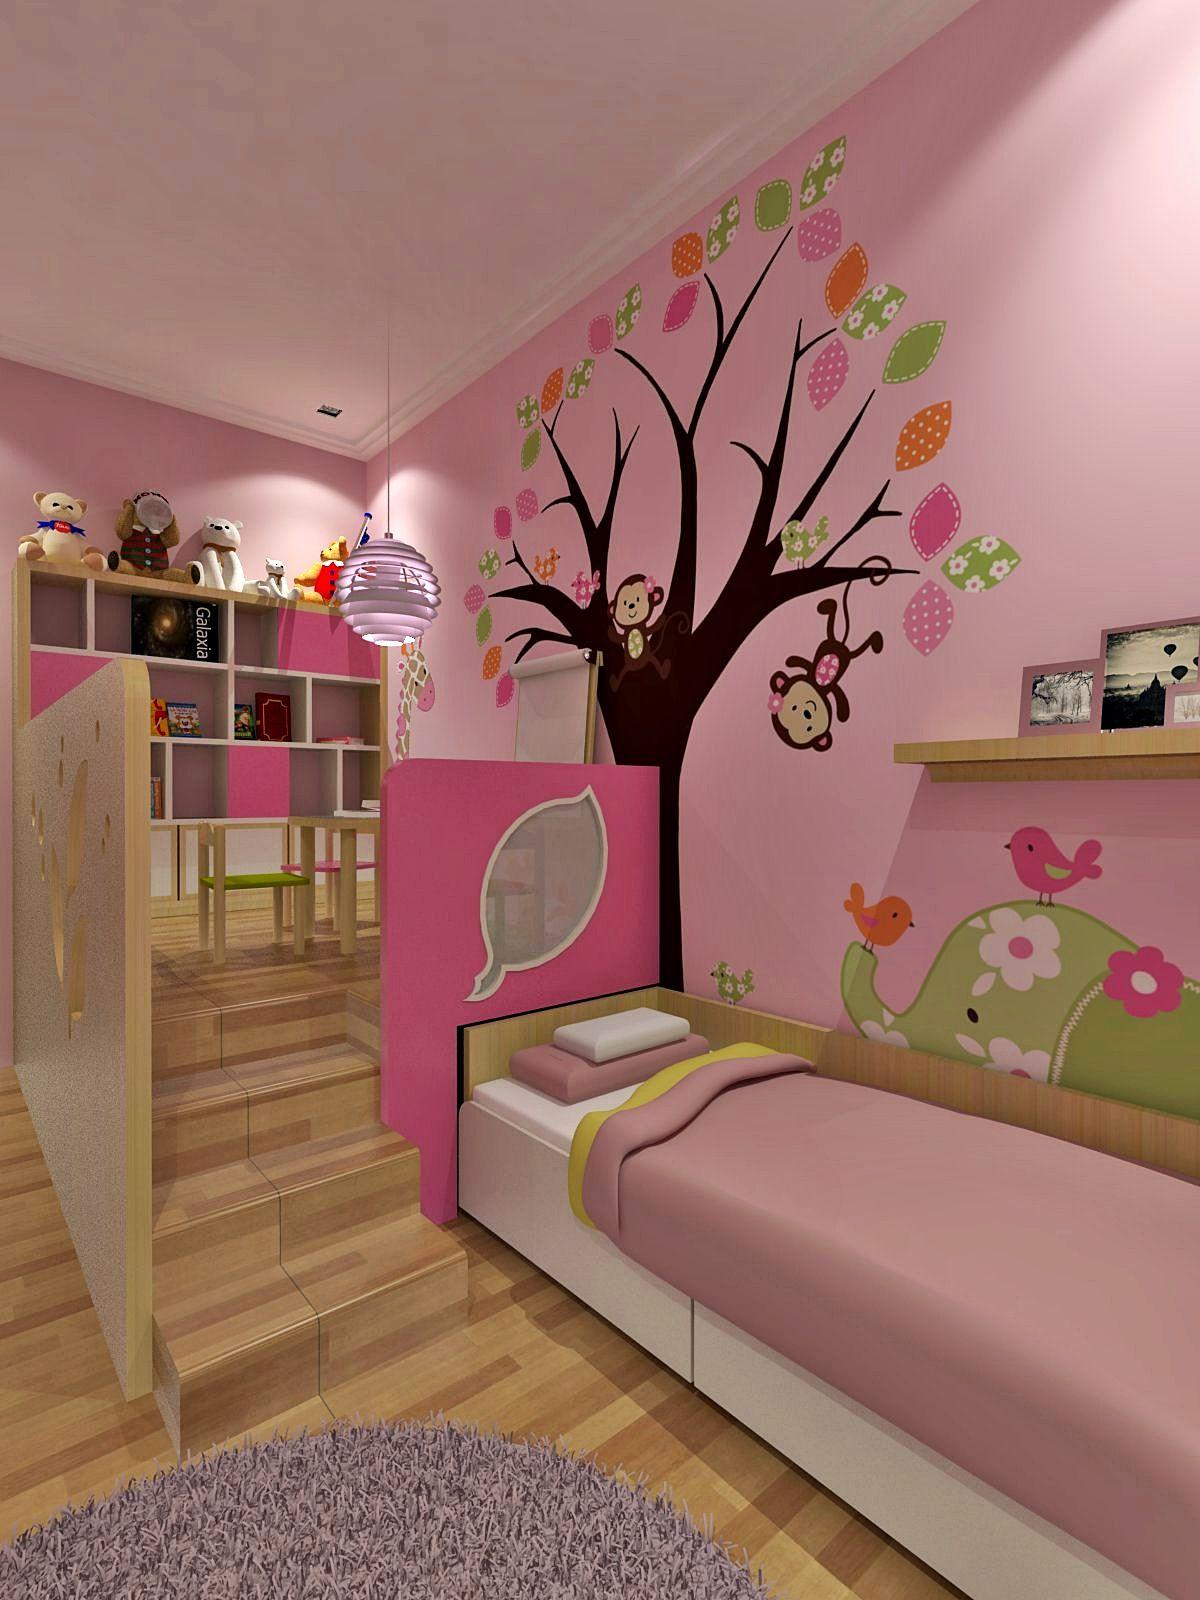 Interior design kamar tidur anak perempuang wall decor also rumah decoracion recamara cuarto nina rh ar pinterest